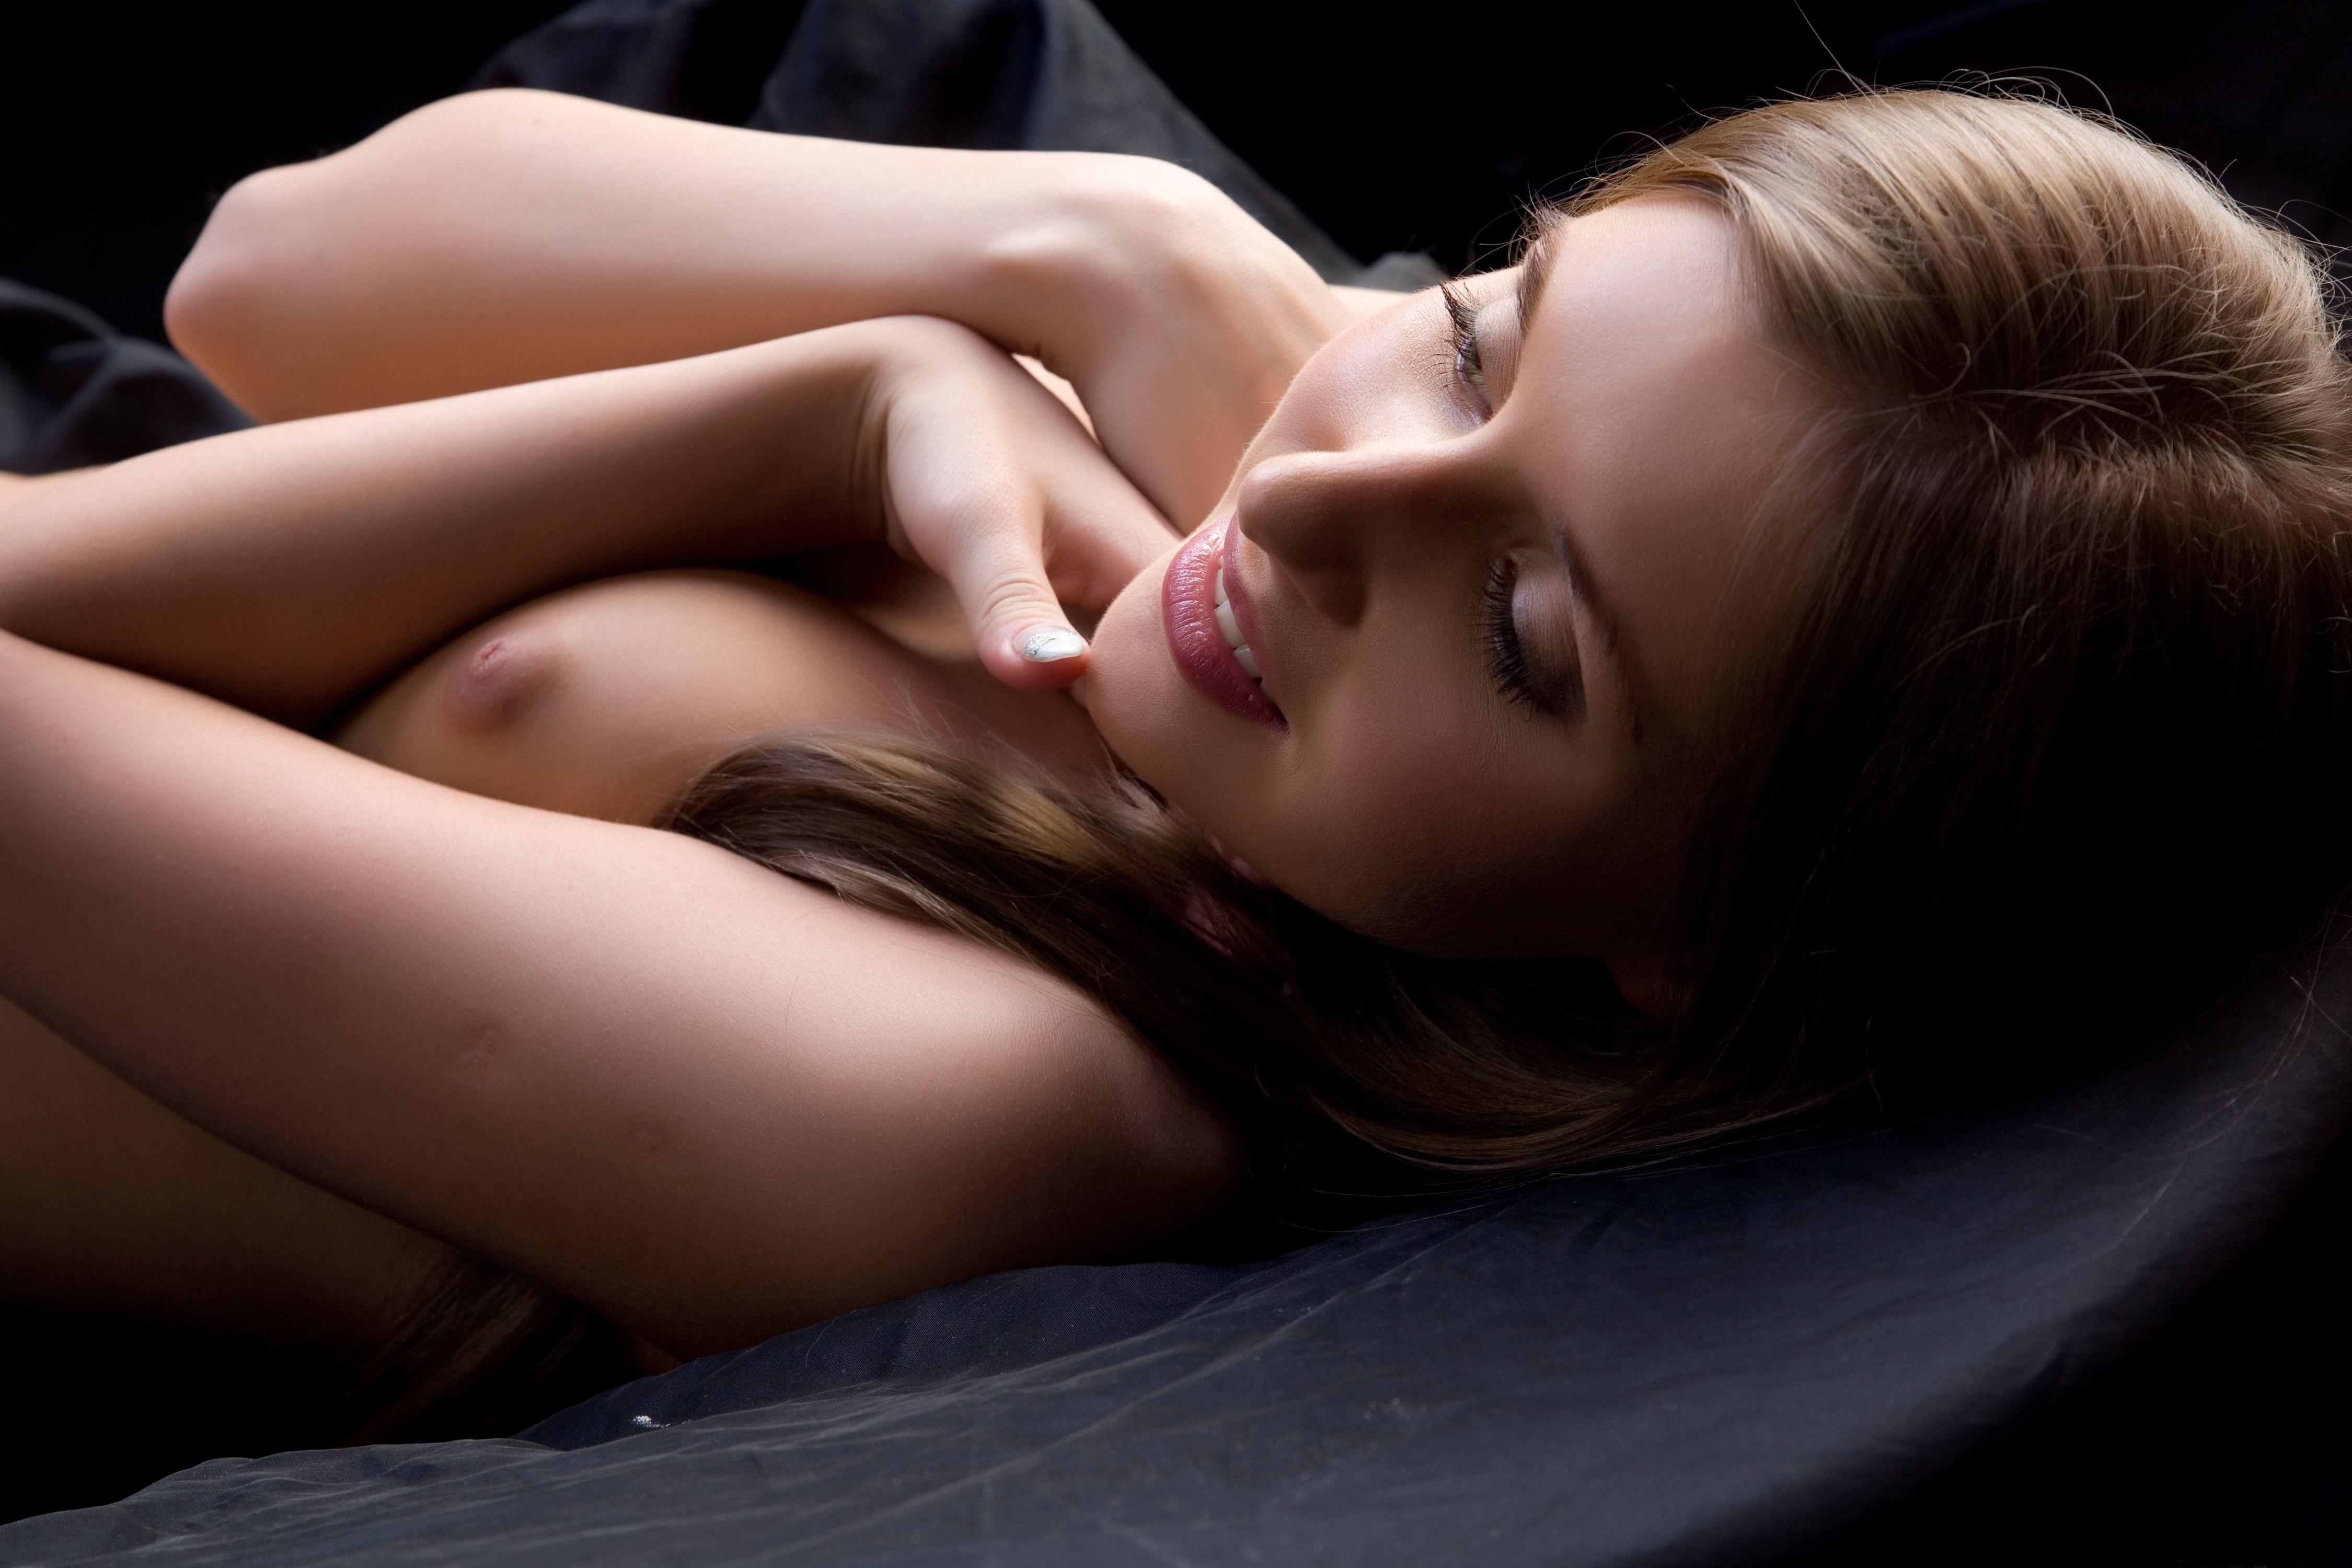 Download photo 4500x3000, viva b, brunette, sexy girl ...